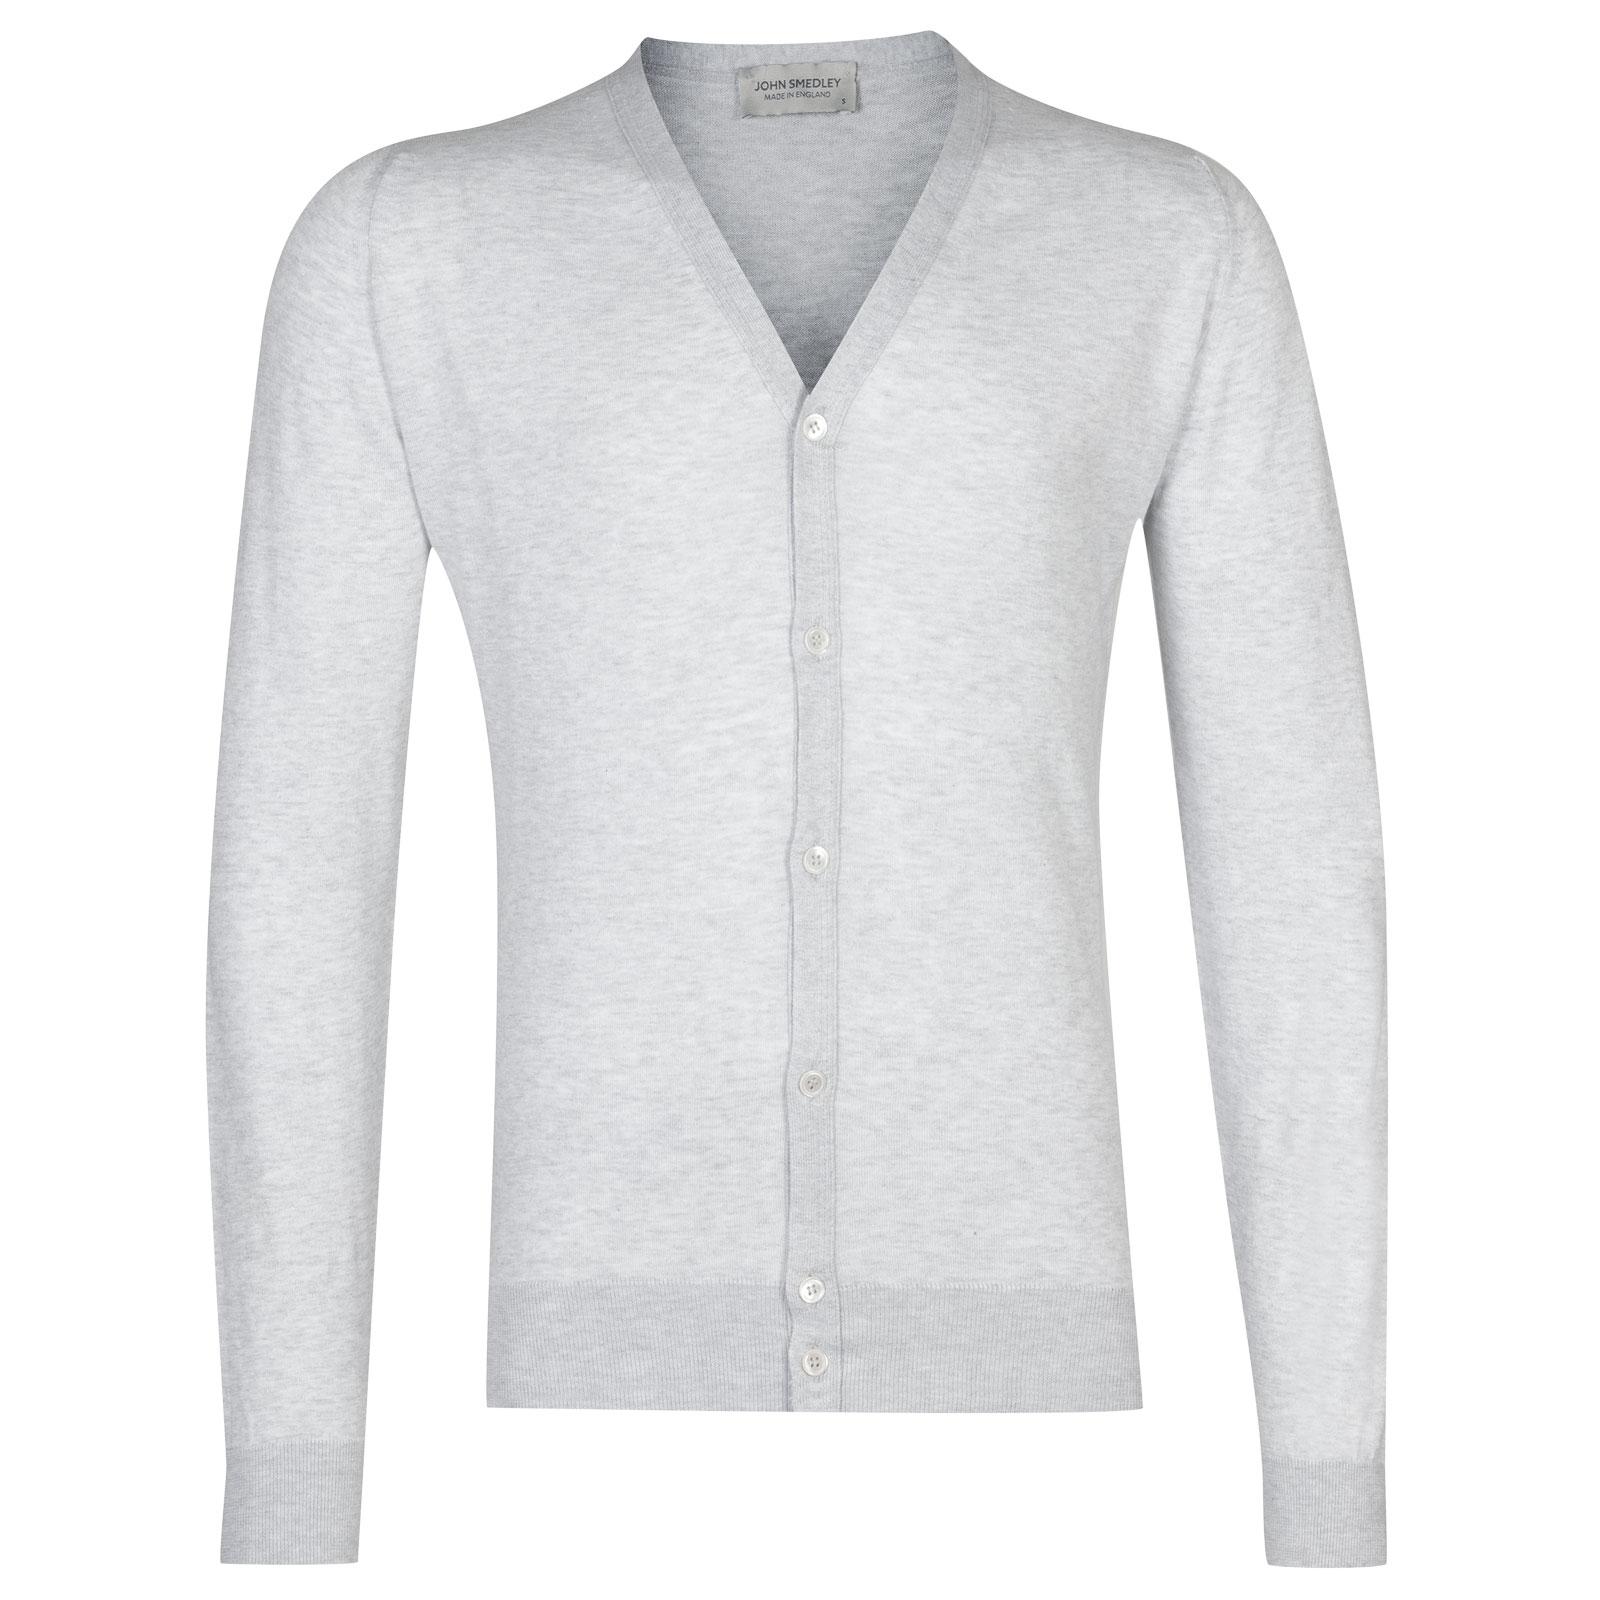 John Smedley whitchurch Sea Island Cotton Cardigan in Feather Grey-XL